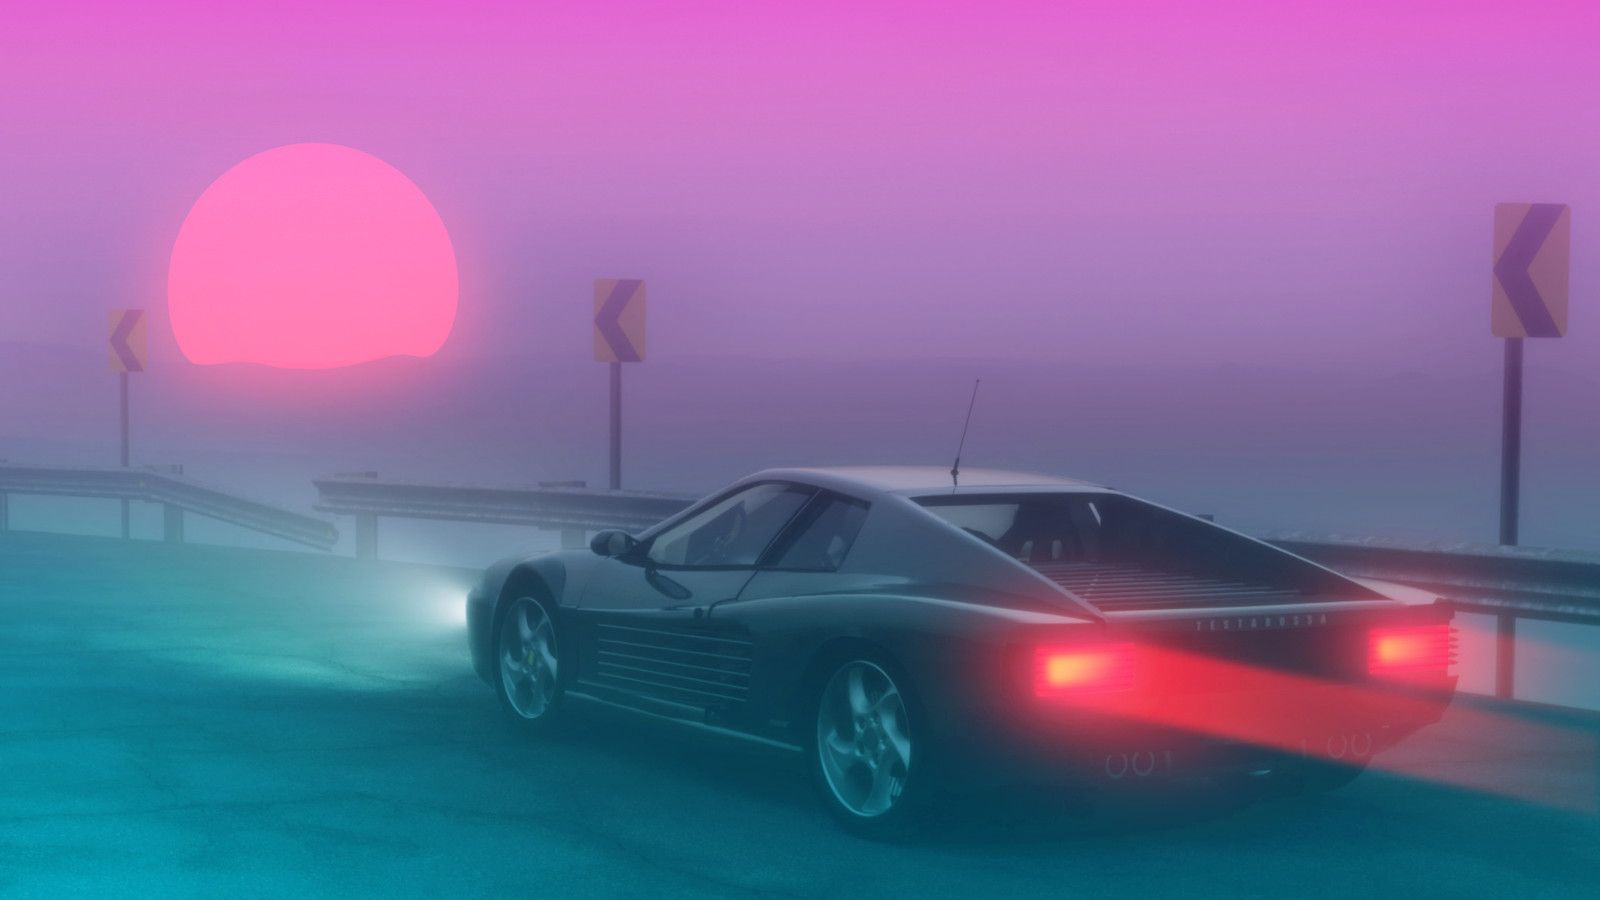 Miami Coast Michael Lg On Artstation At Https Www Artstation Com Artwork Lo3qp Synthwave Ferrari Testarossa Retro Waves